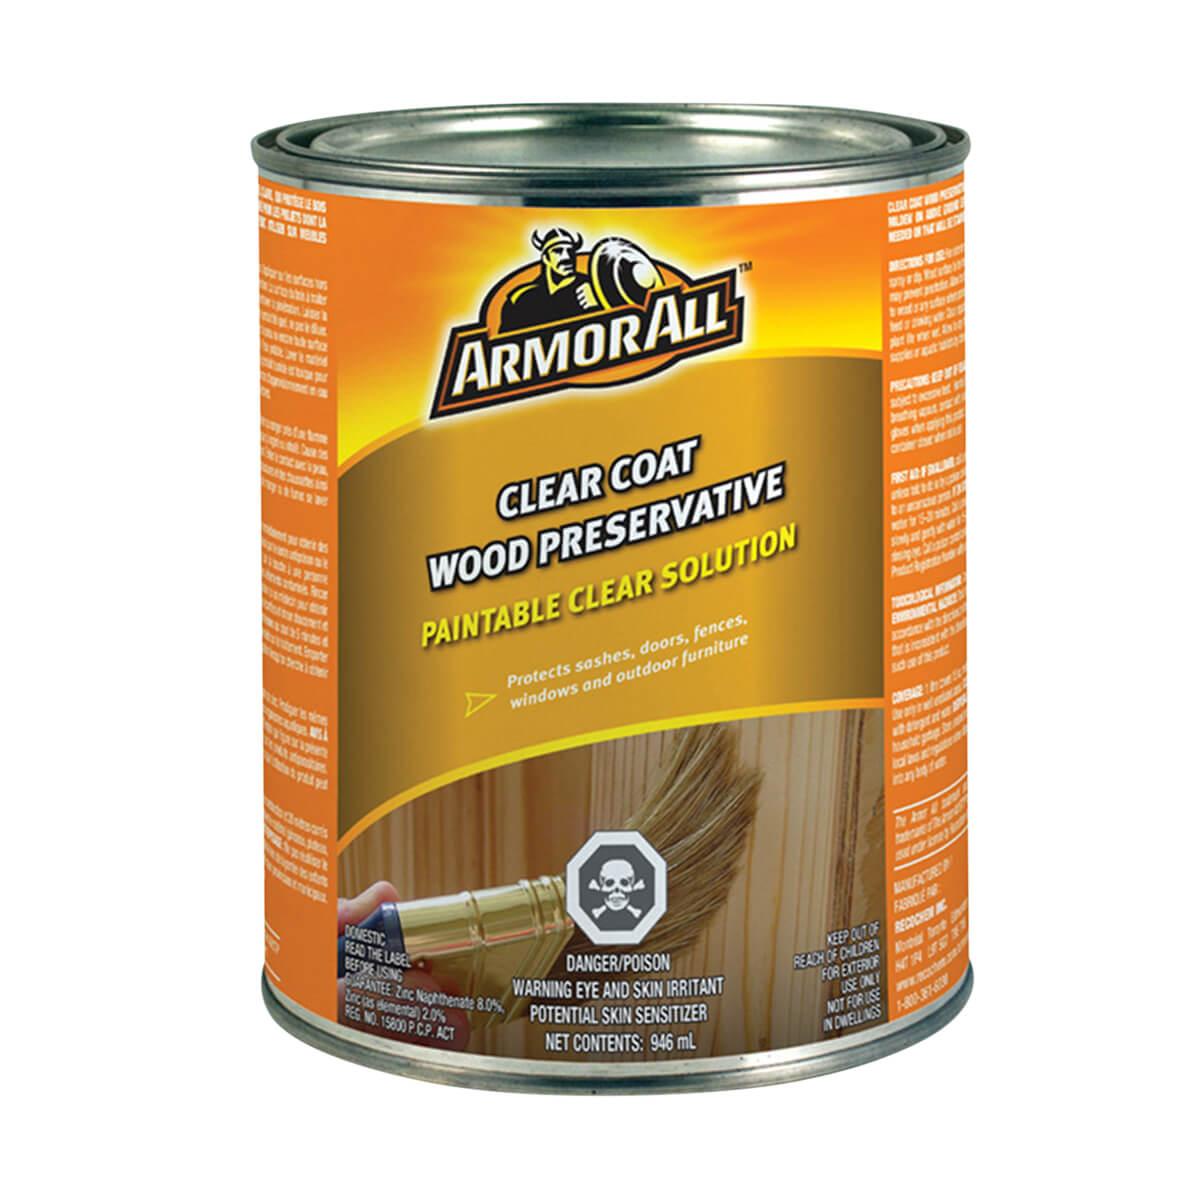 Armor All® 3.78L Clear Coat Wood Preservative